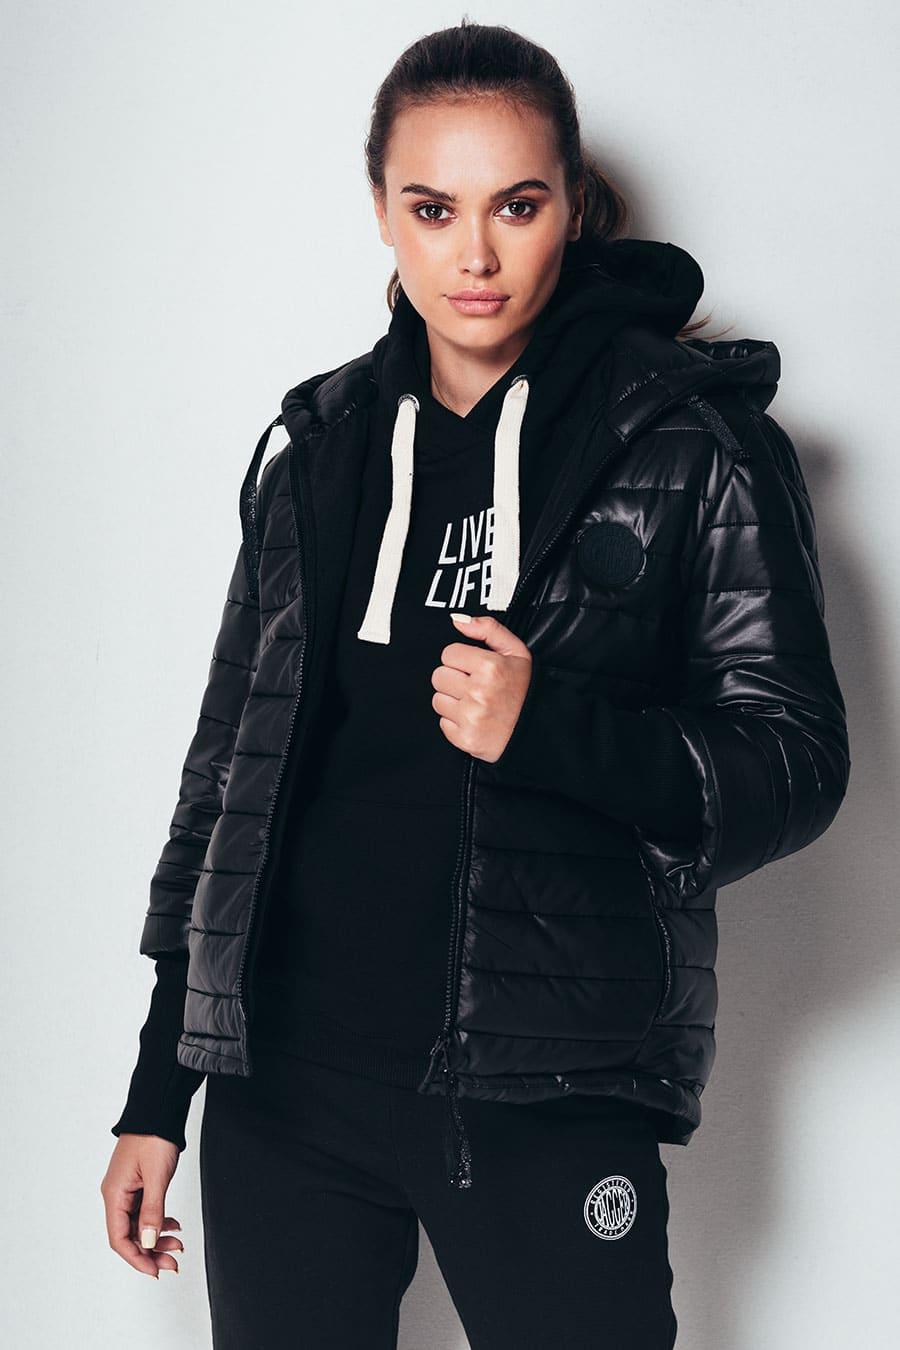 jagger internet prodavnica kolekcija jesen zima 2021 zenska jakna jg 6232 01 8